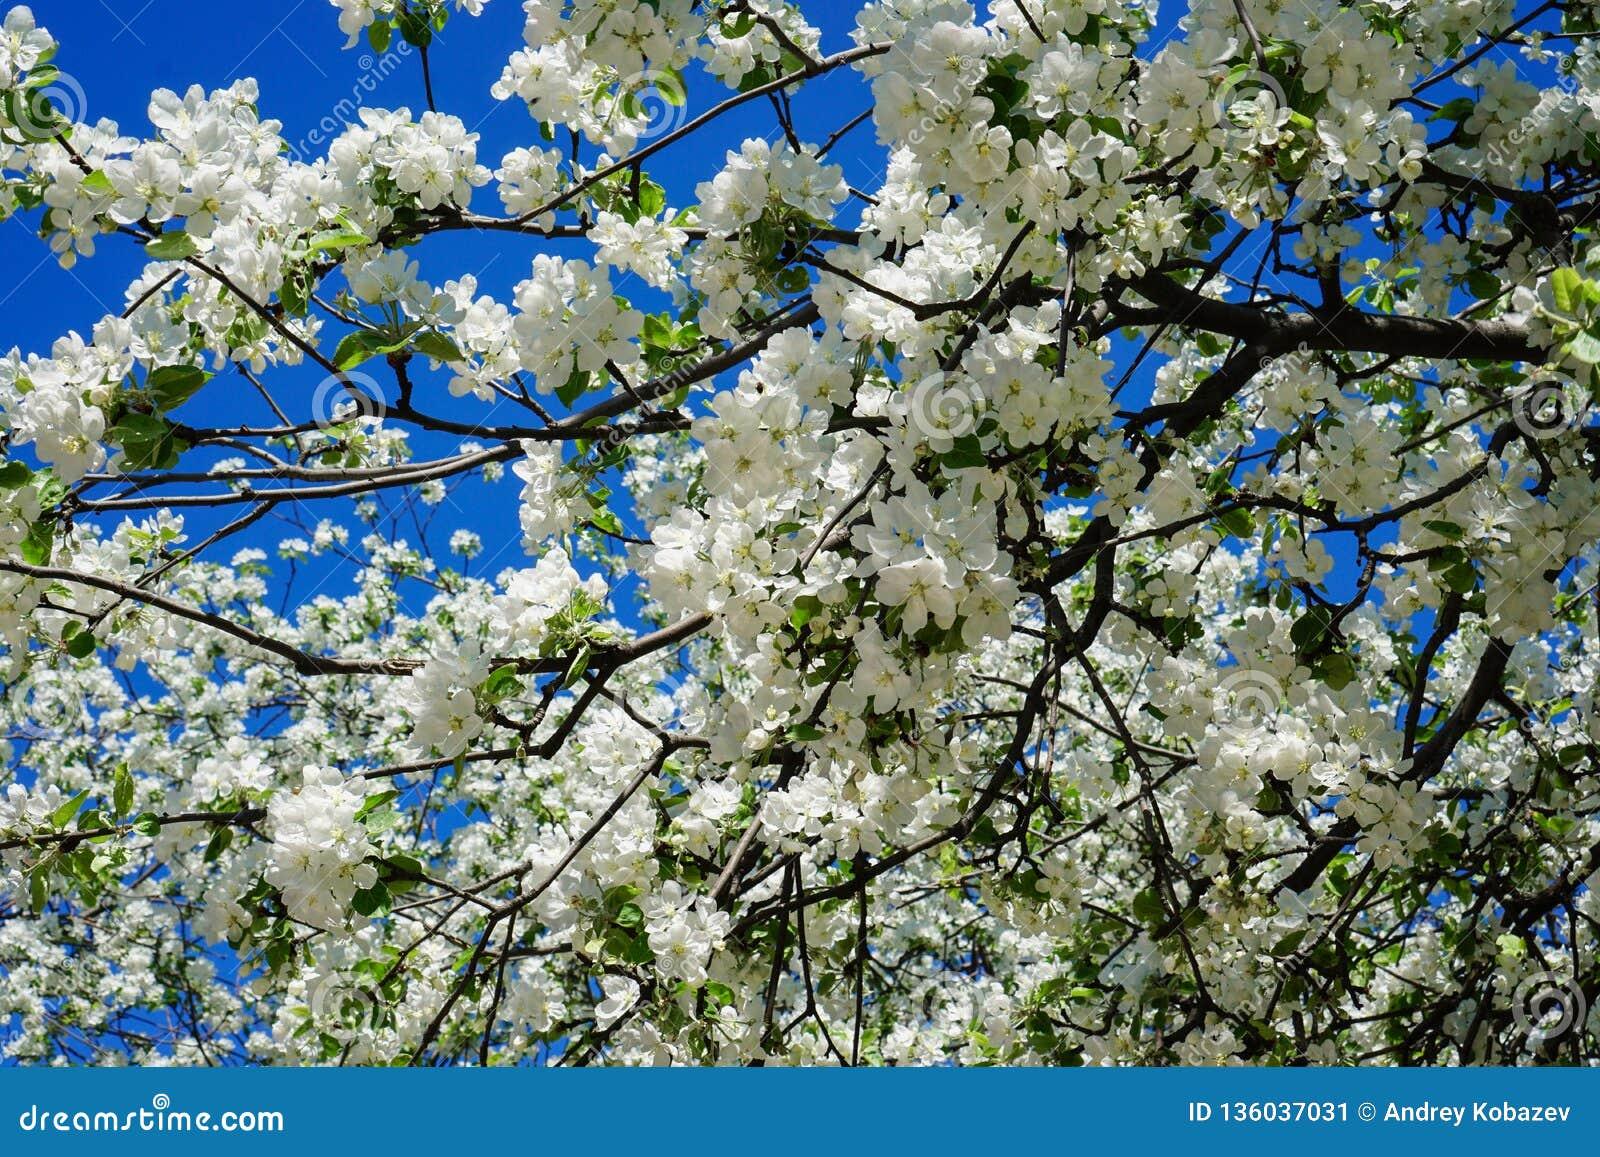 Apple blossom in garden